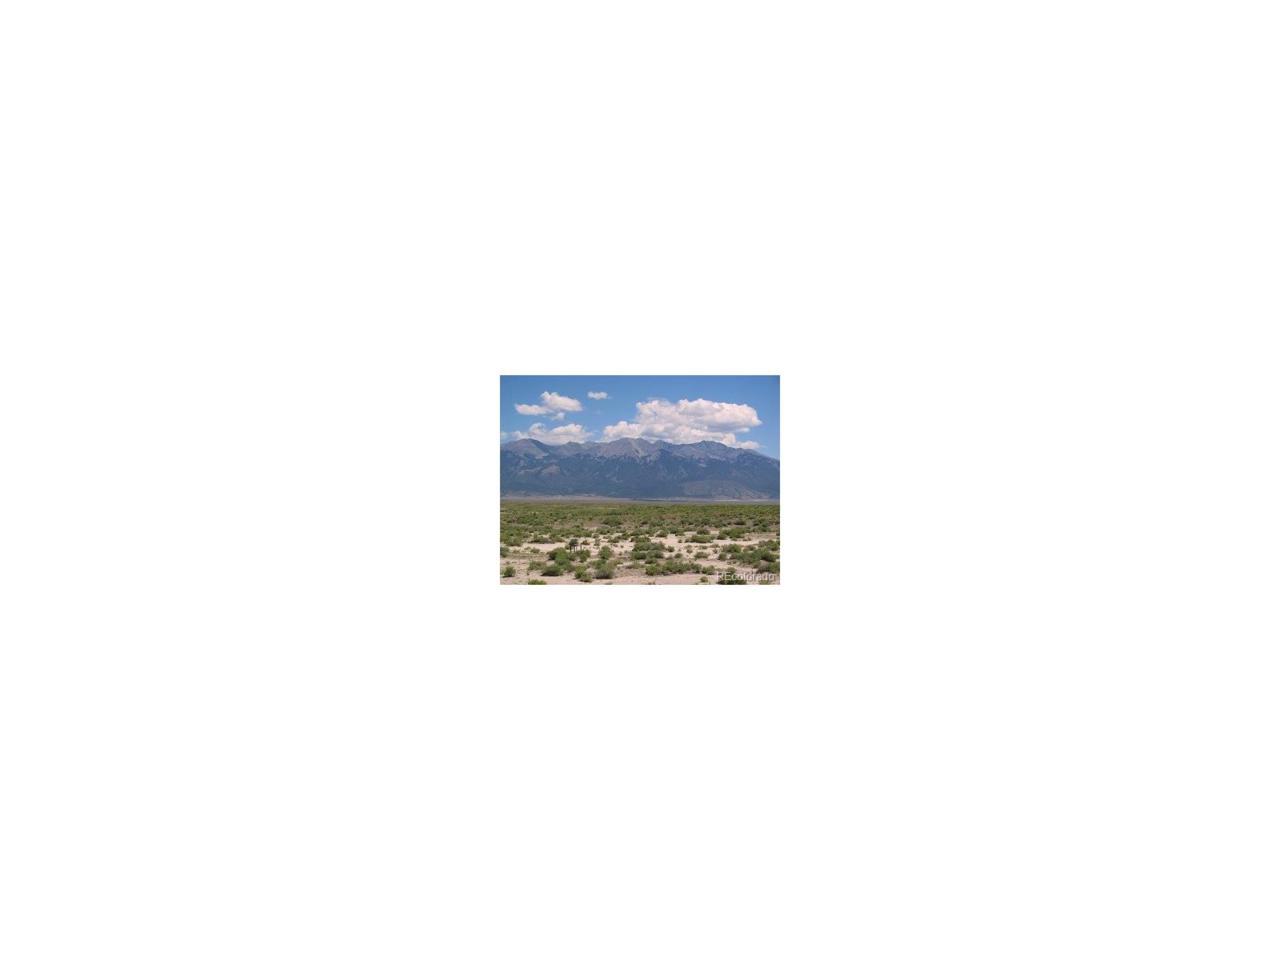 16825 Tantalum Lane, Mosca, CO 81146 (MLS #4209796) :: 8z Real Estate